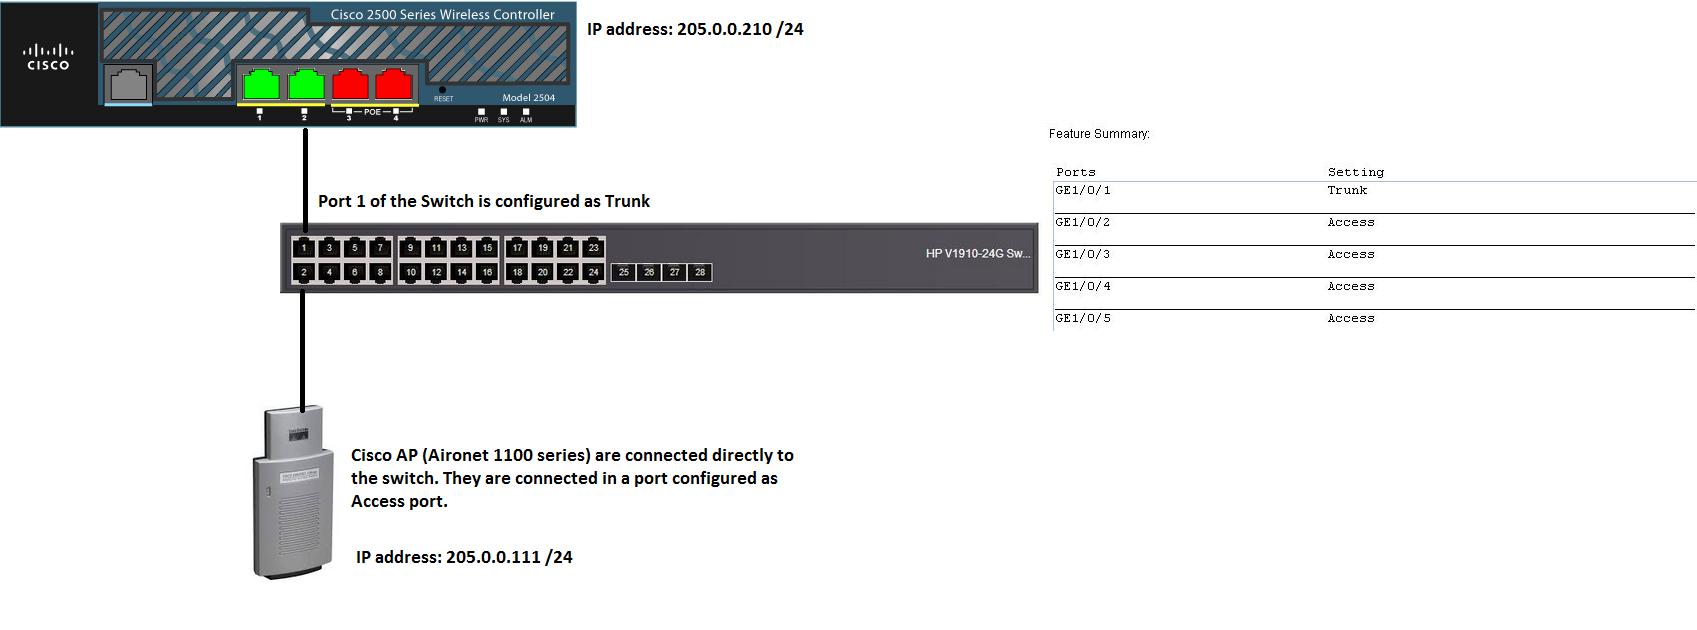 Help To Configure Cisco 2500 Series Wireless Controller